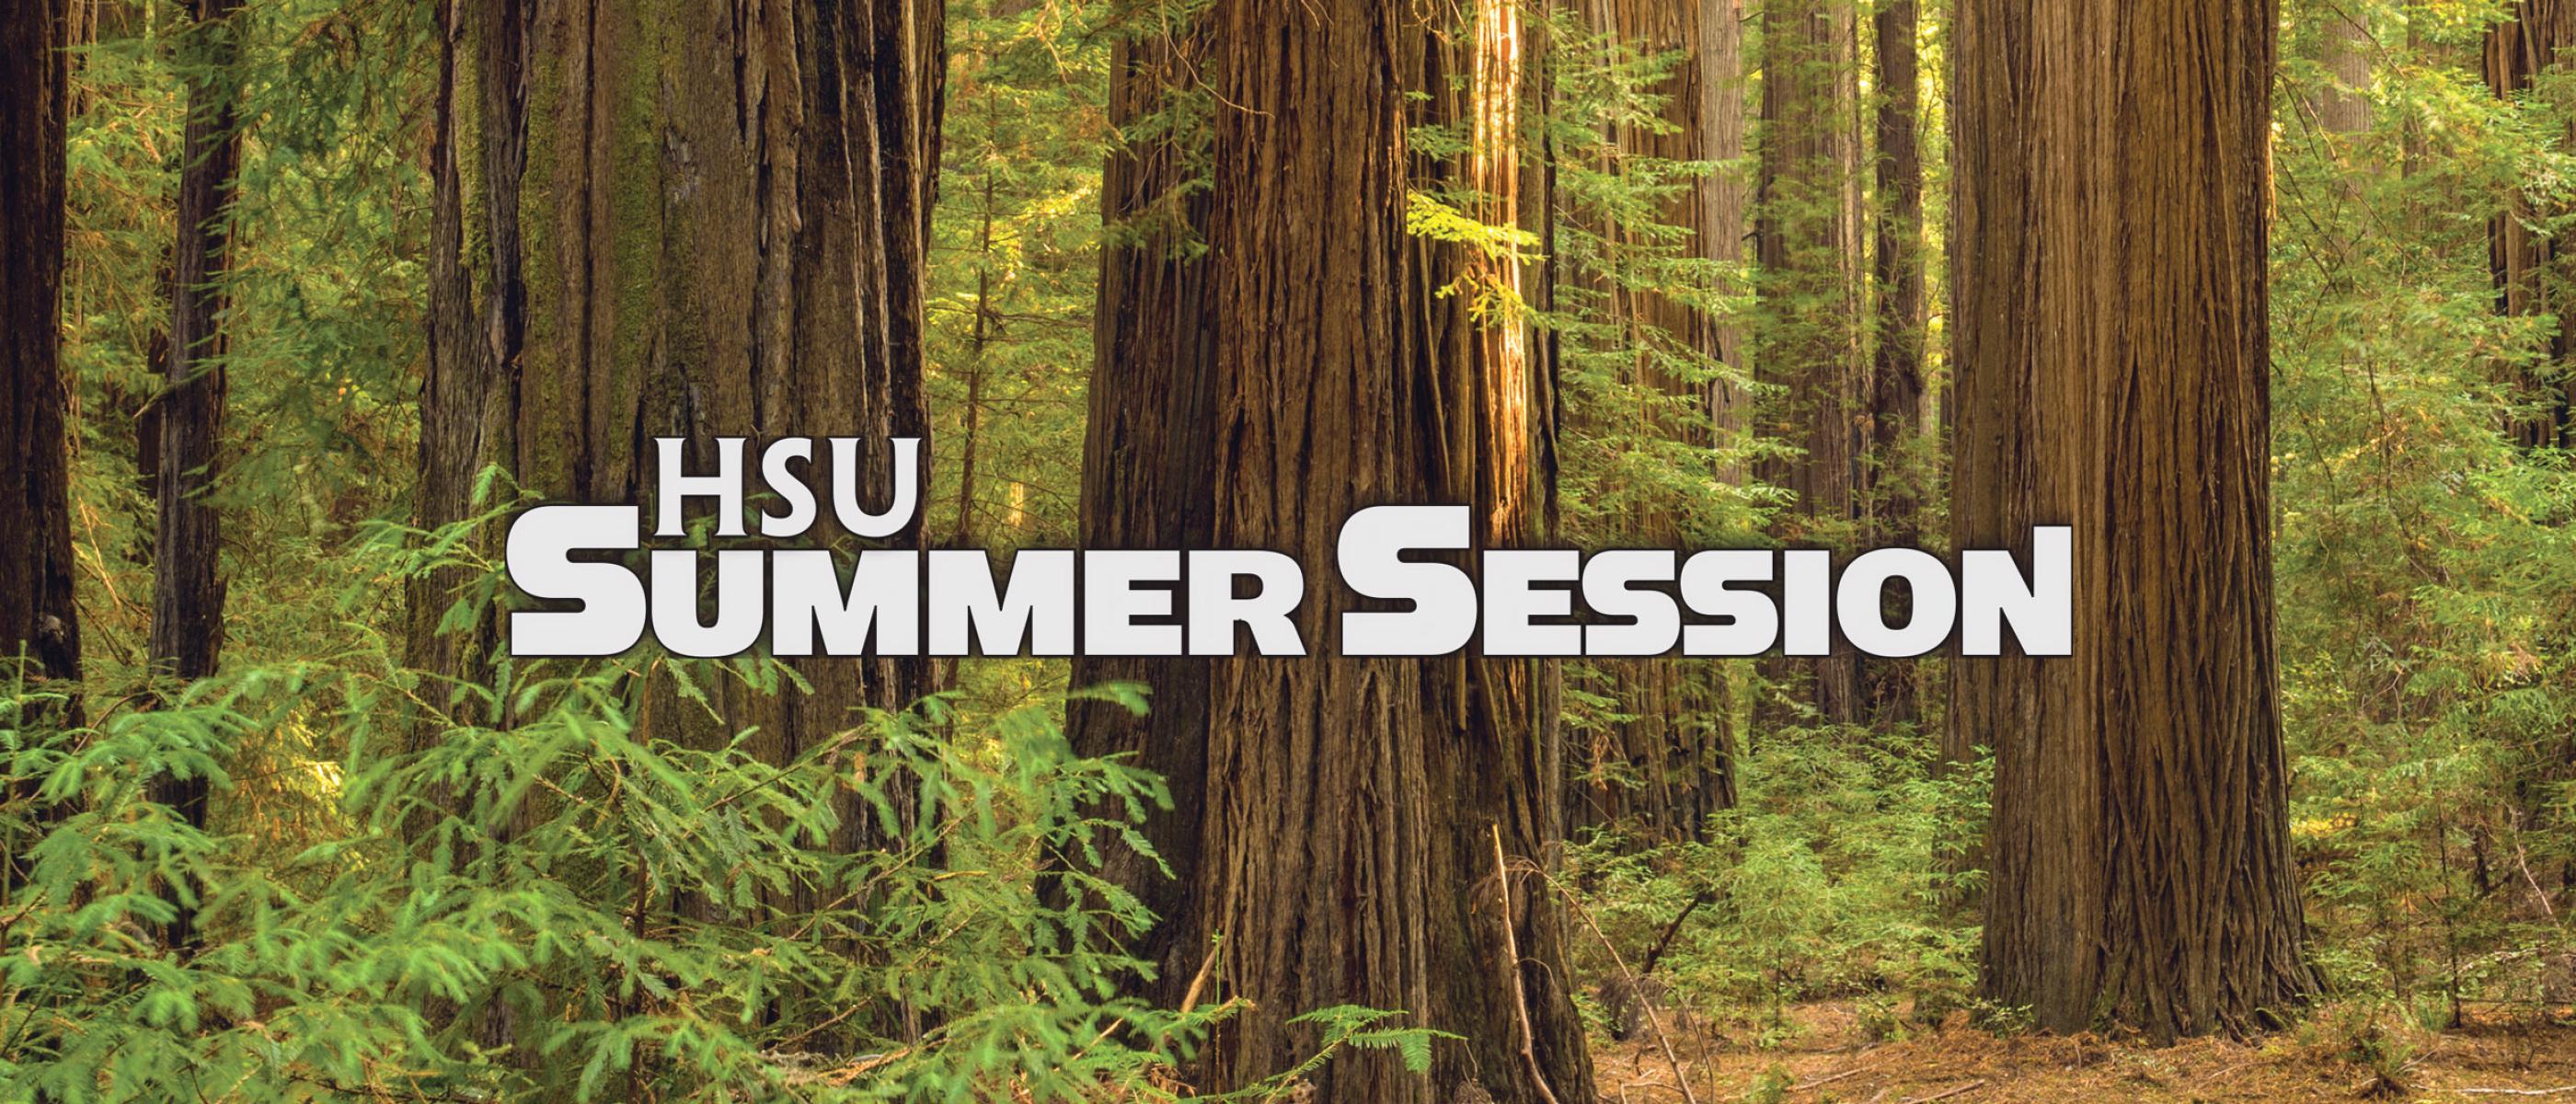 HSU Summer Session